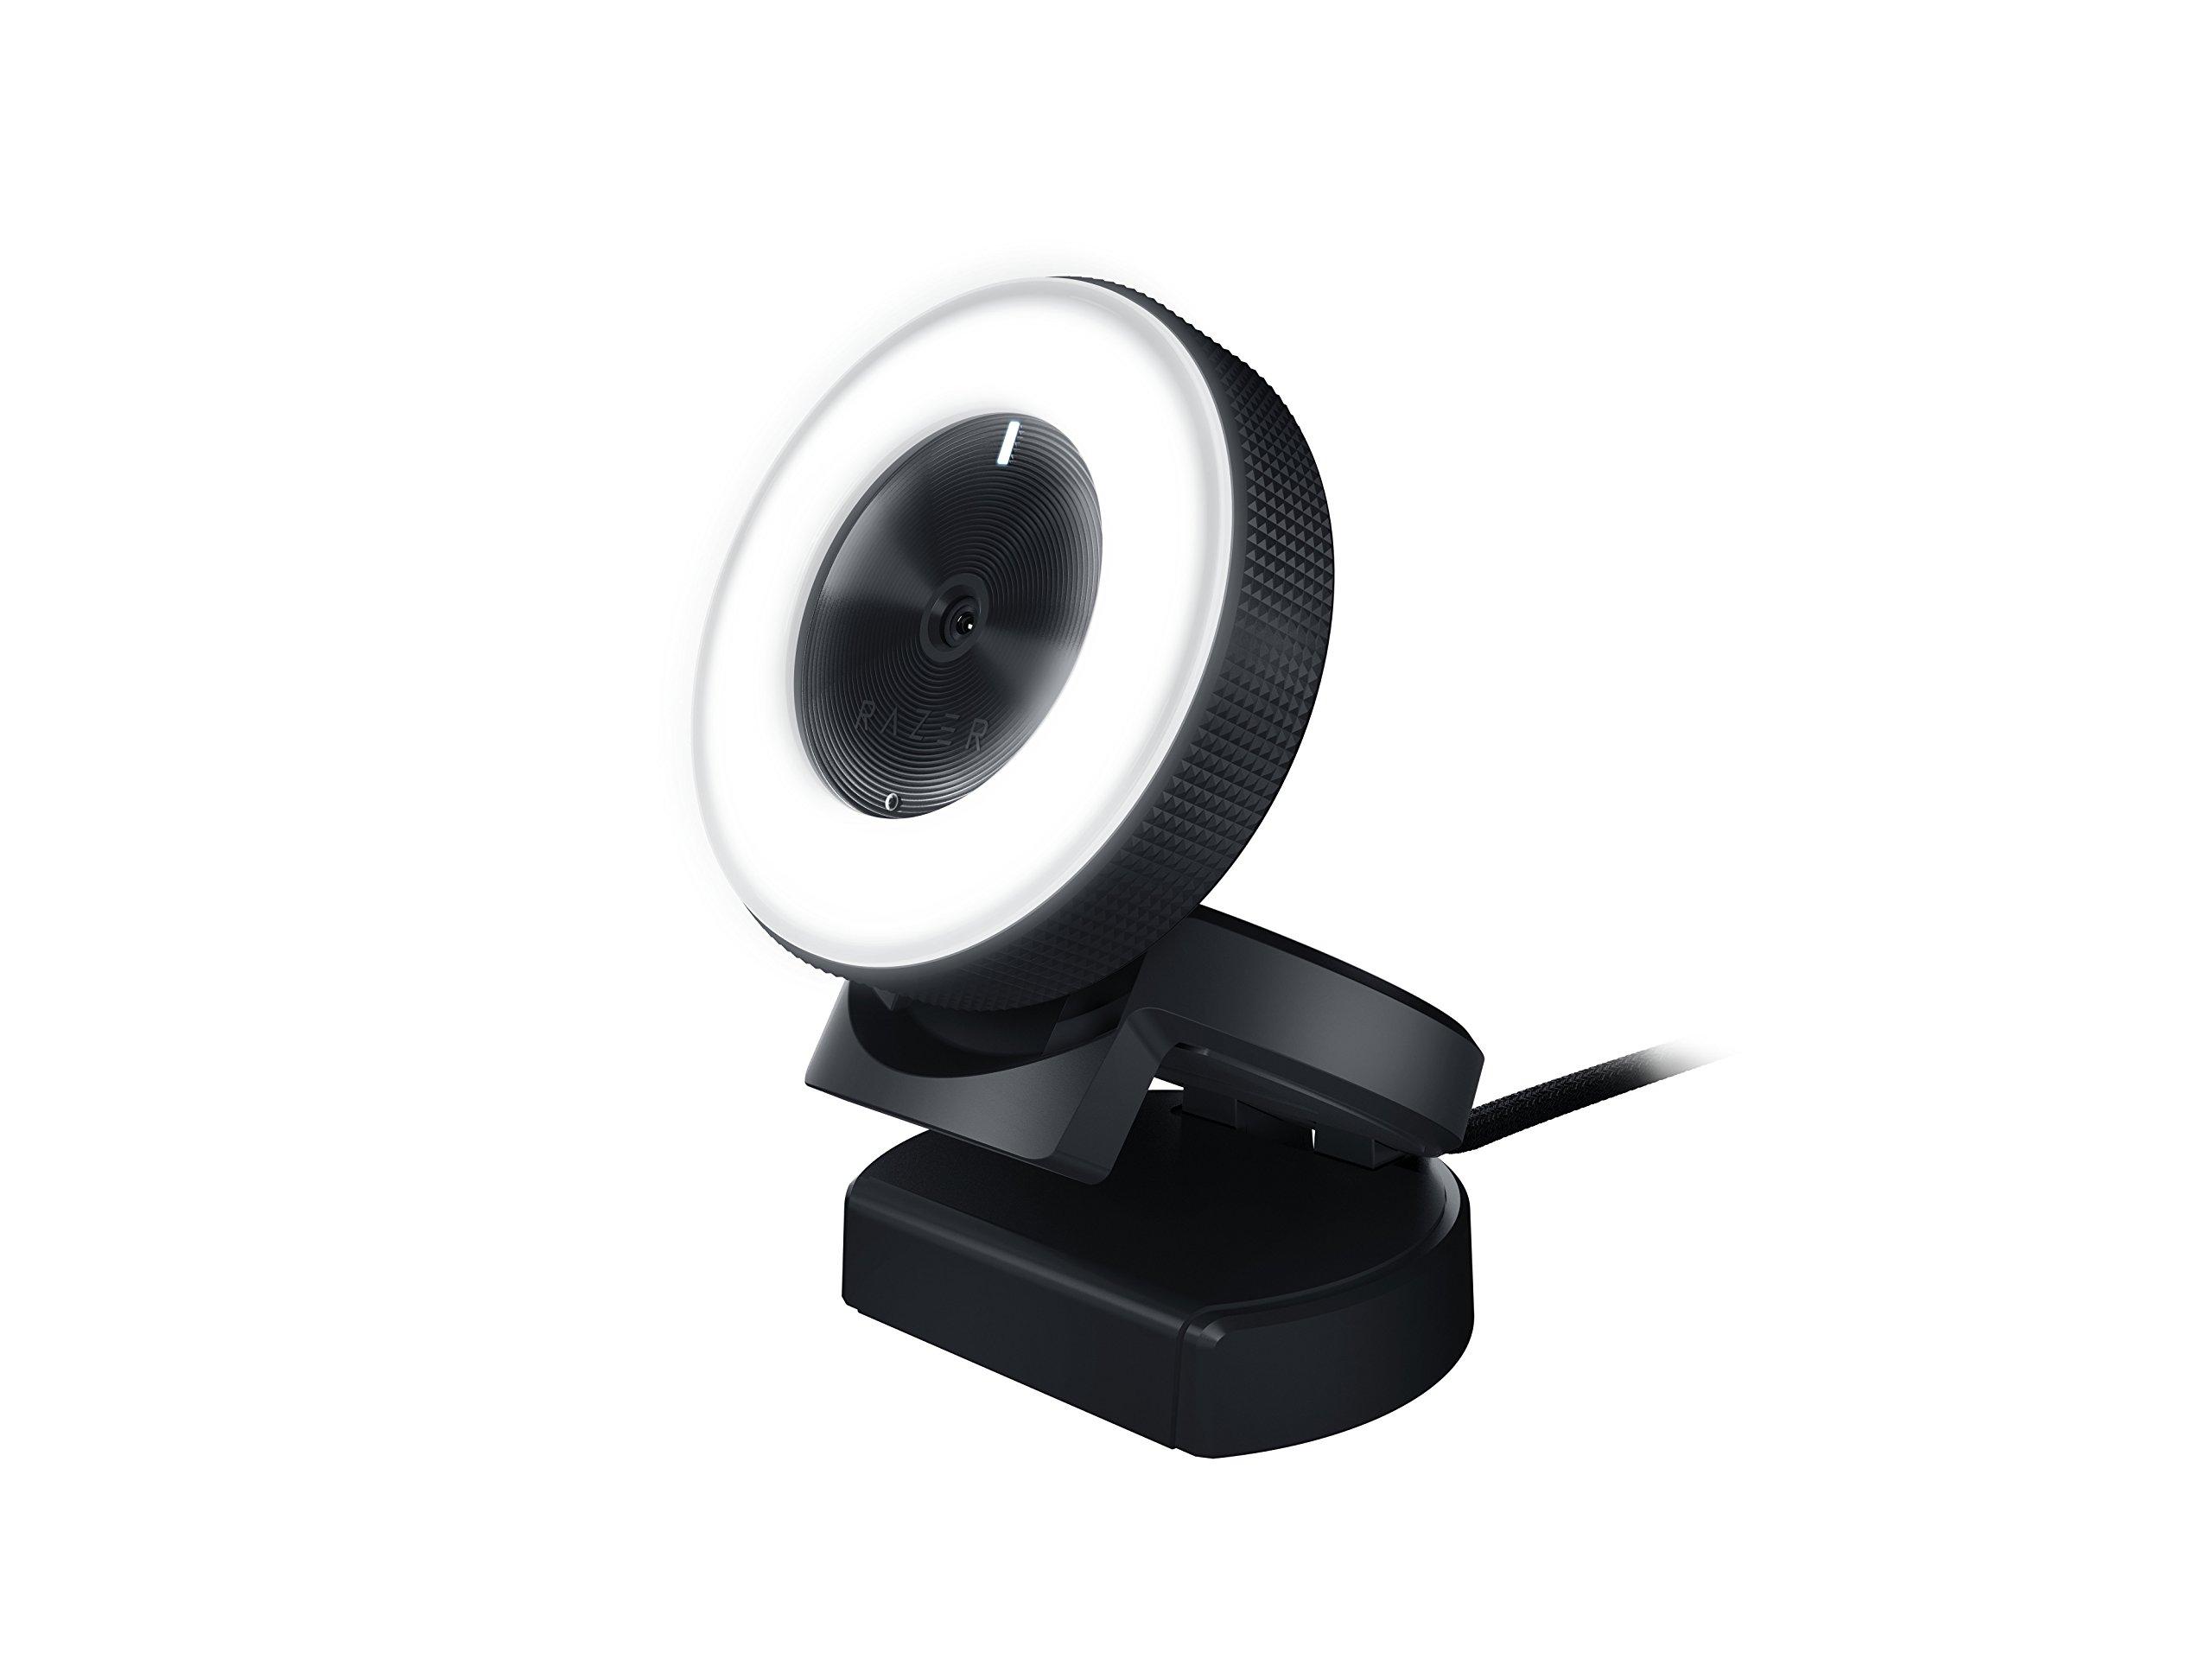 Razer Kiyo Streaming Webcam: 1080p 30 FPS / 720p 60 FPS - Ring Light w/ Adjustable Brightness  - Built-in Microphone - Advanced Autofocus by Razer